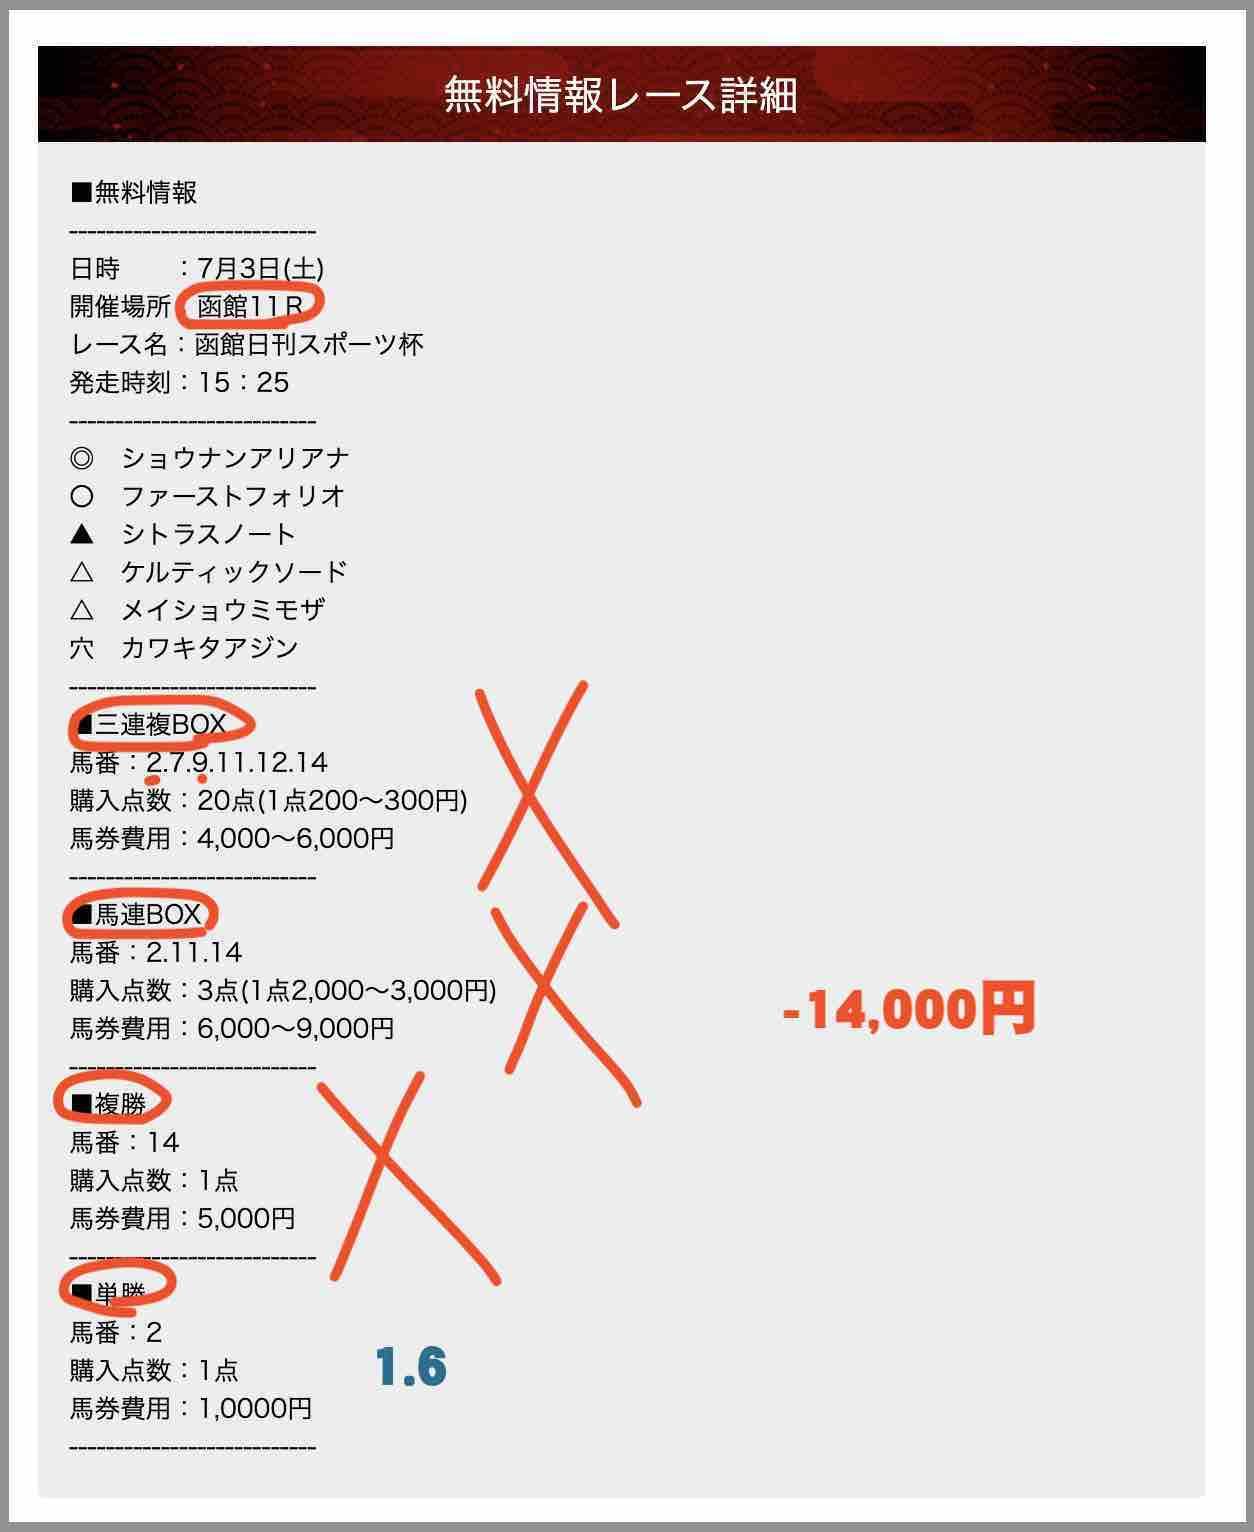 TENKEI(天啓)という競馬予想サイトの無料予想(無料情報)の抜き打ち検証